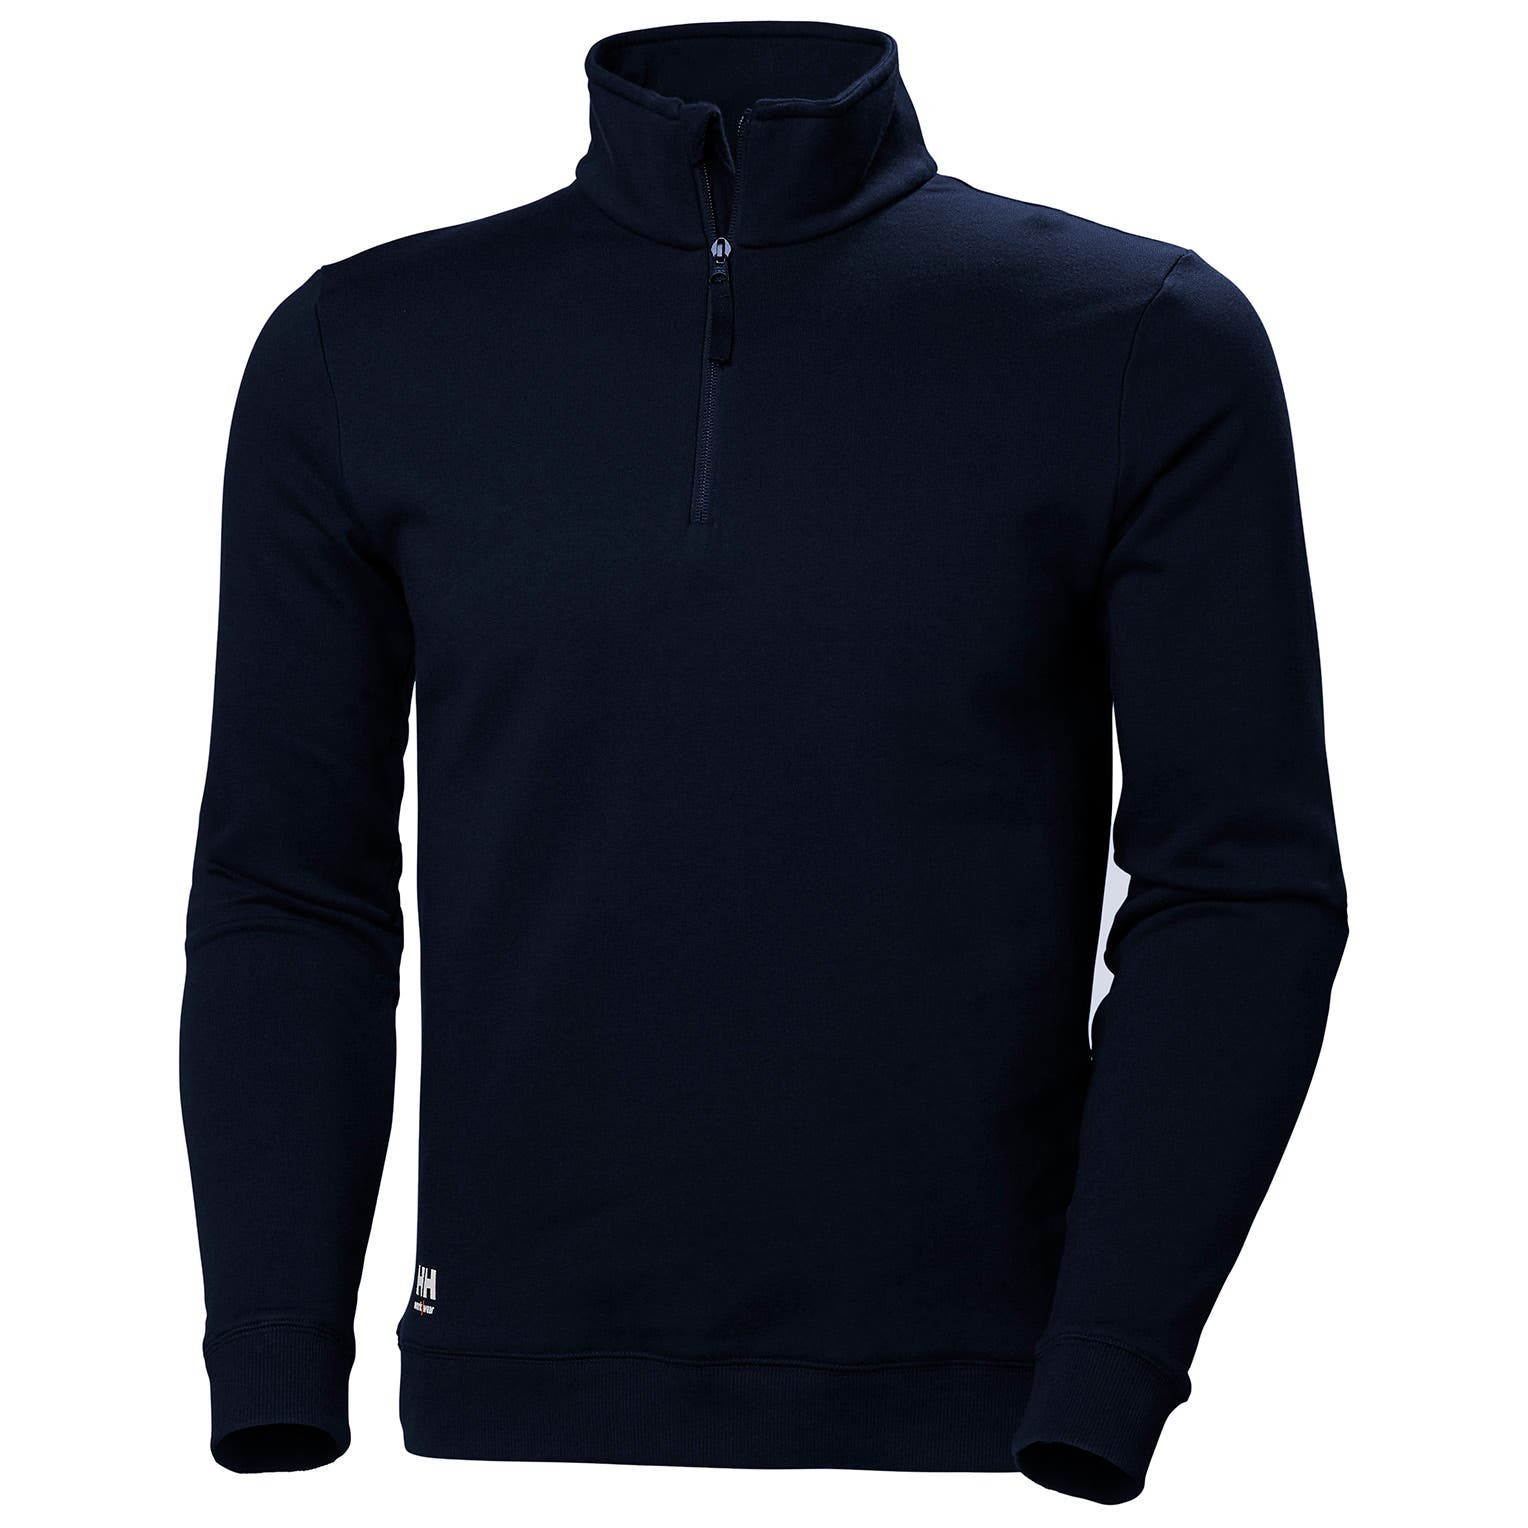 Свитшот на молнии Helly Hansen Manchester HZ Sweatshirt - 79210 (Navy; S)